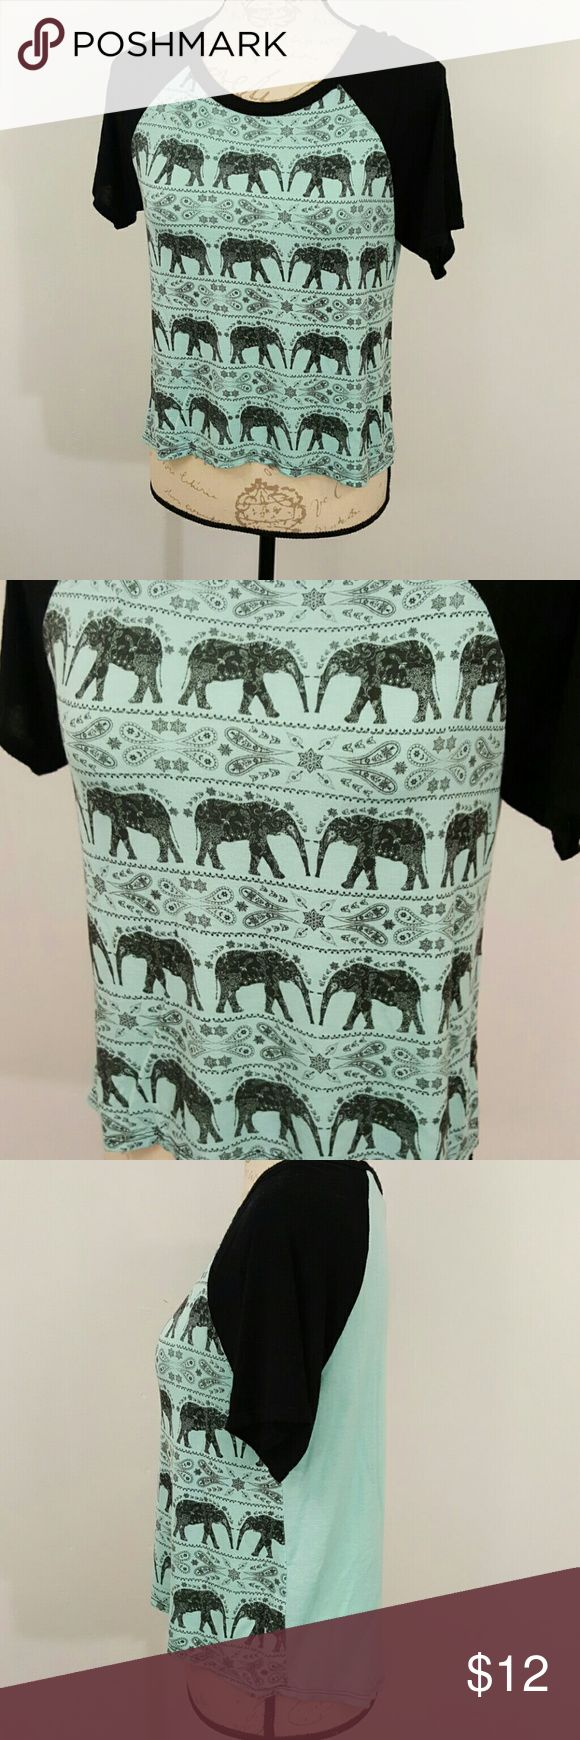 Rue 21 Blue Green Black Elephant Shirt Rayon M This is a blue sea green and black elephant blouse. Size M. 95% Rayon and 5% Spandex. It is Rue 21 brand.  Nonsmoking home Rue 21 Tops Tees - Short Sleeve